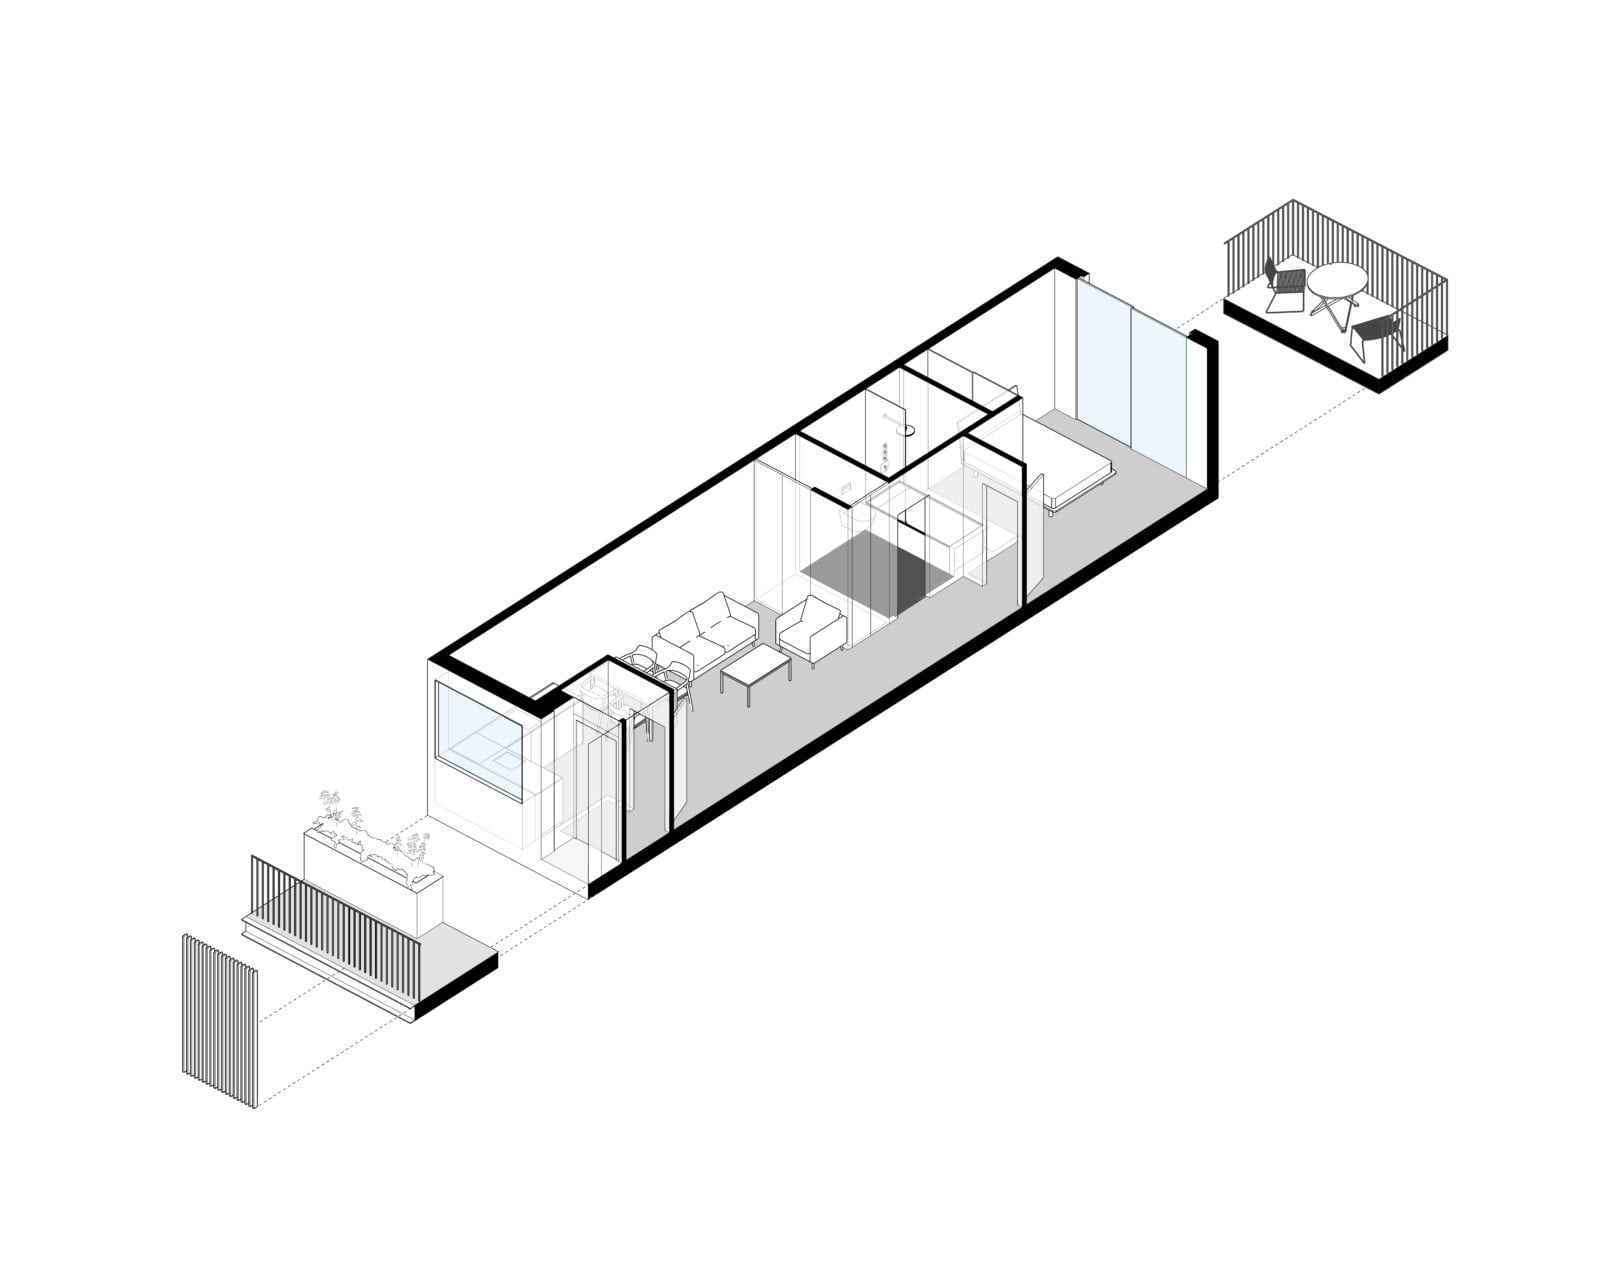 Modular Housing | Neil Davies Architects